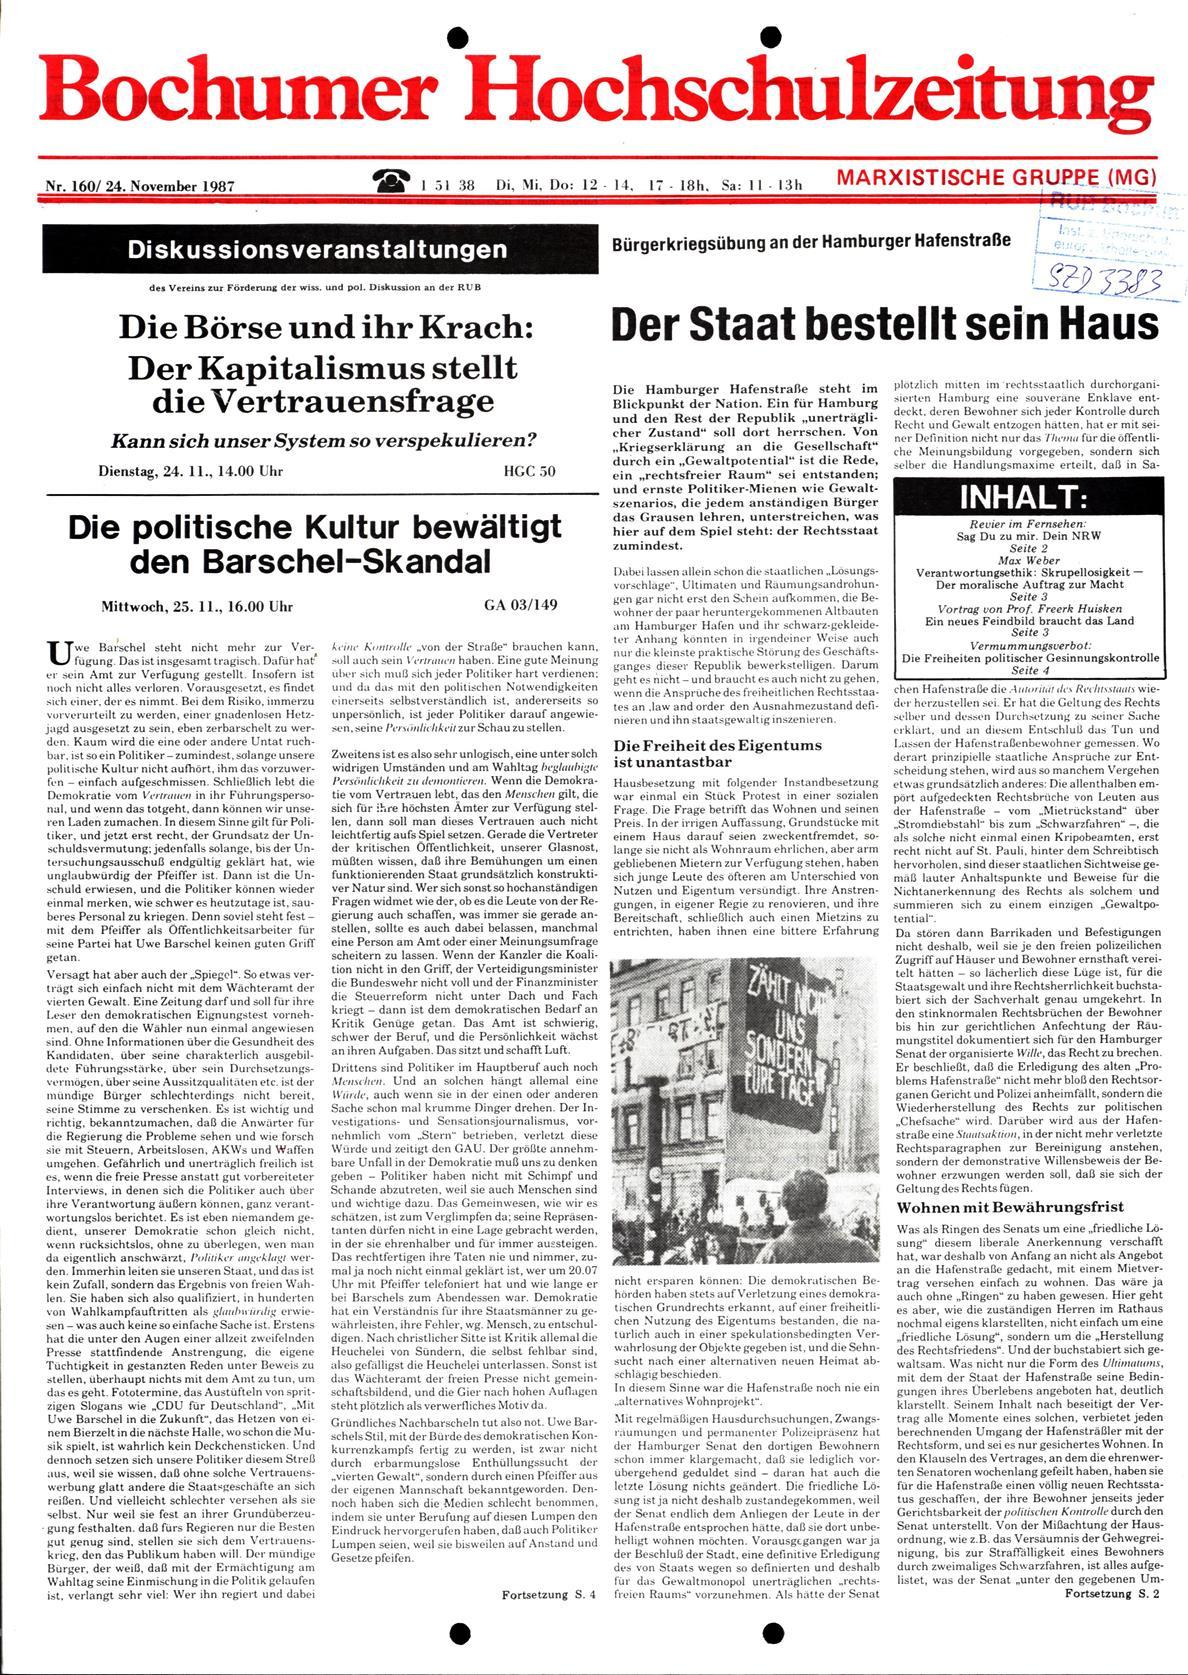 Bochum_BHZ_19871124_160_001